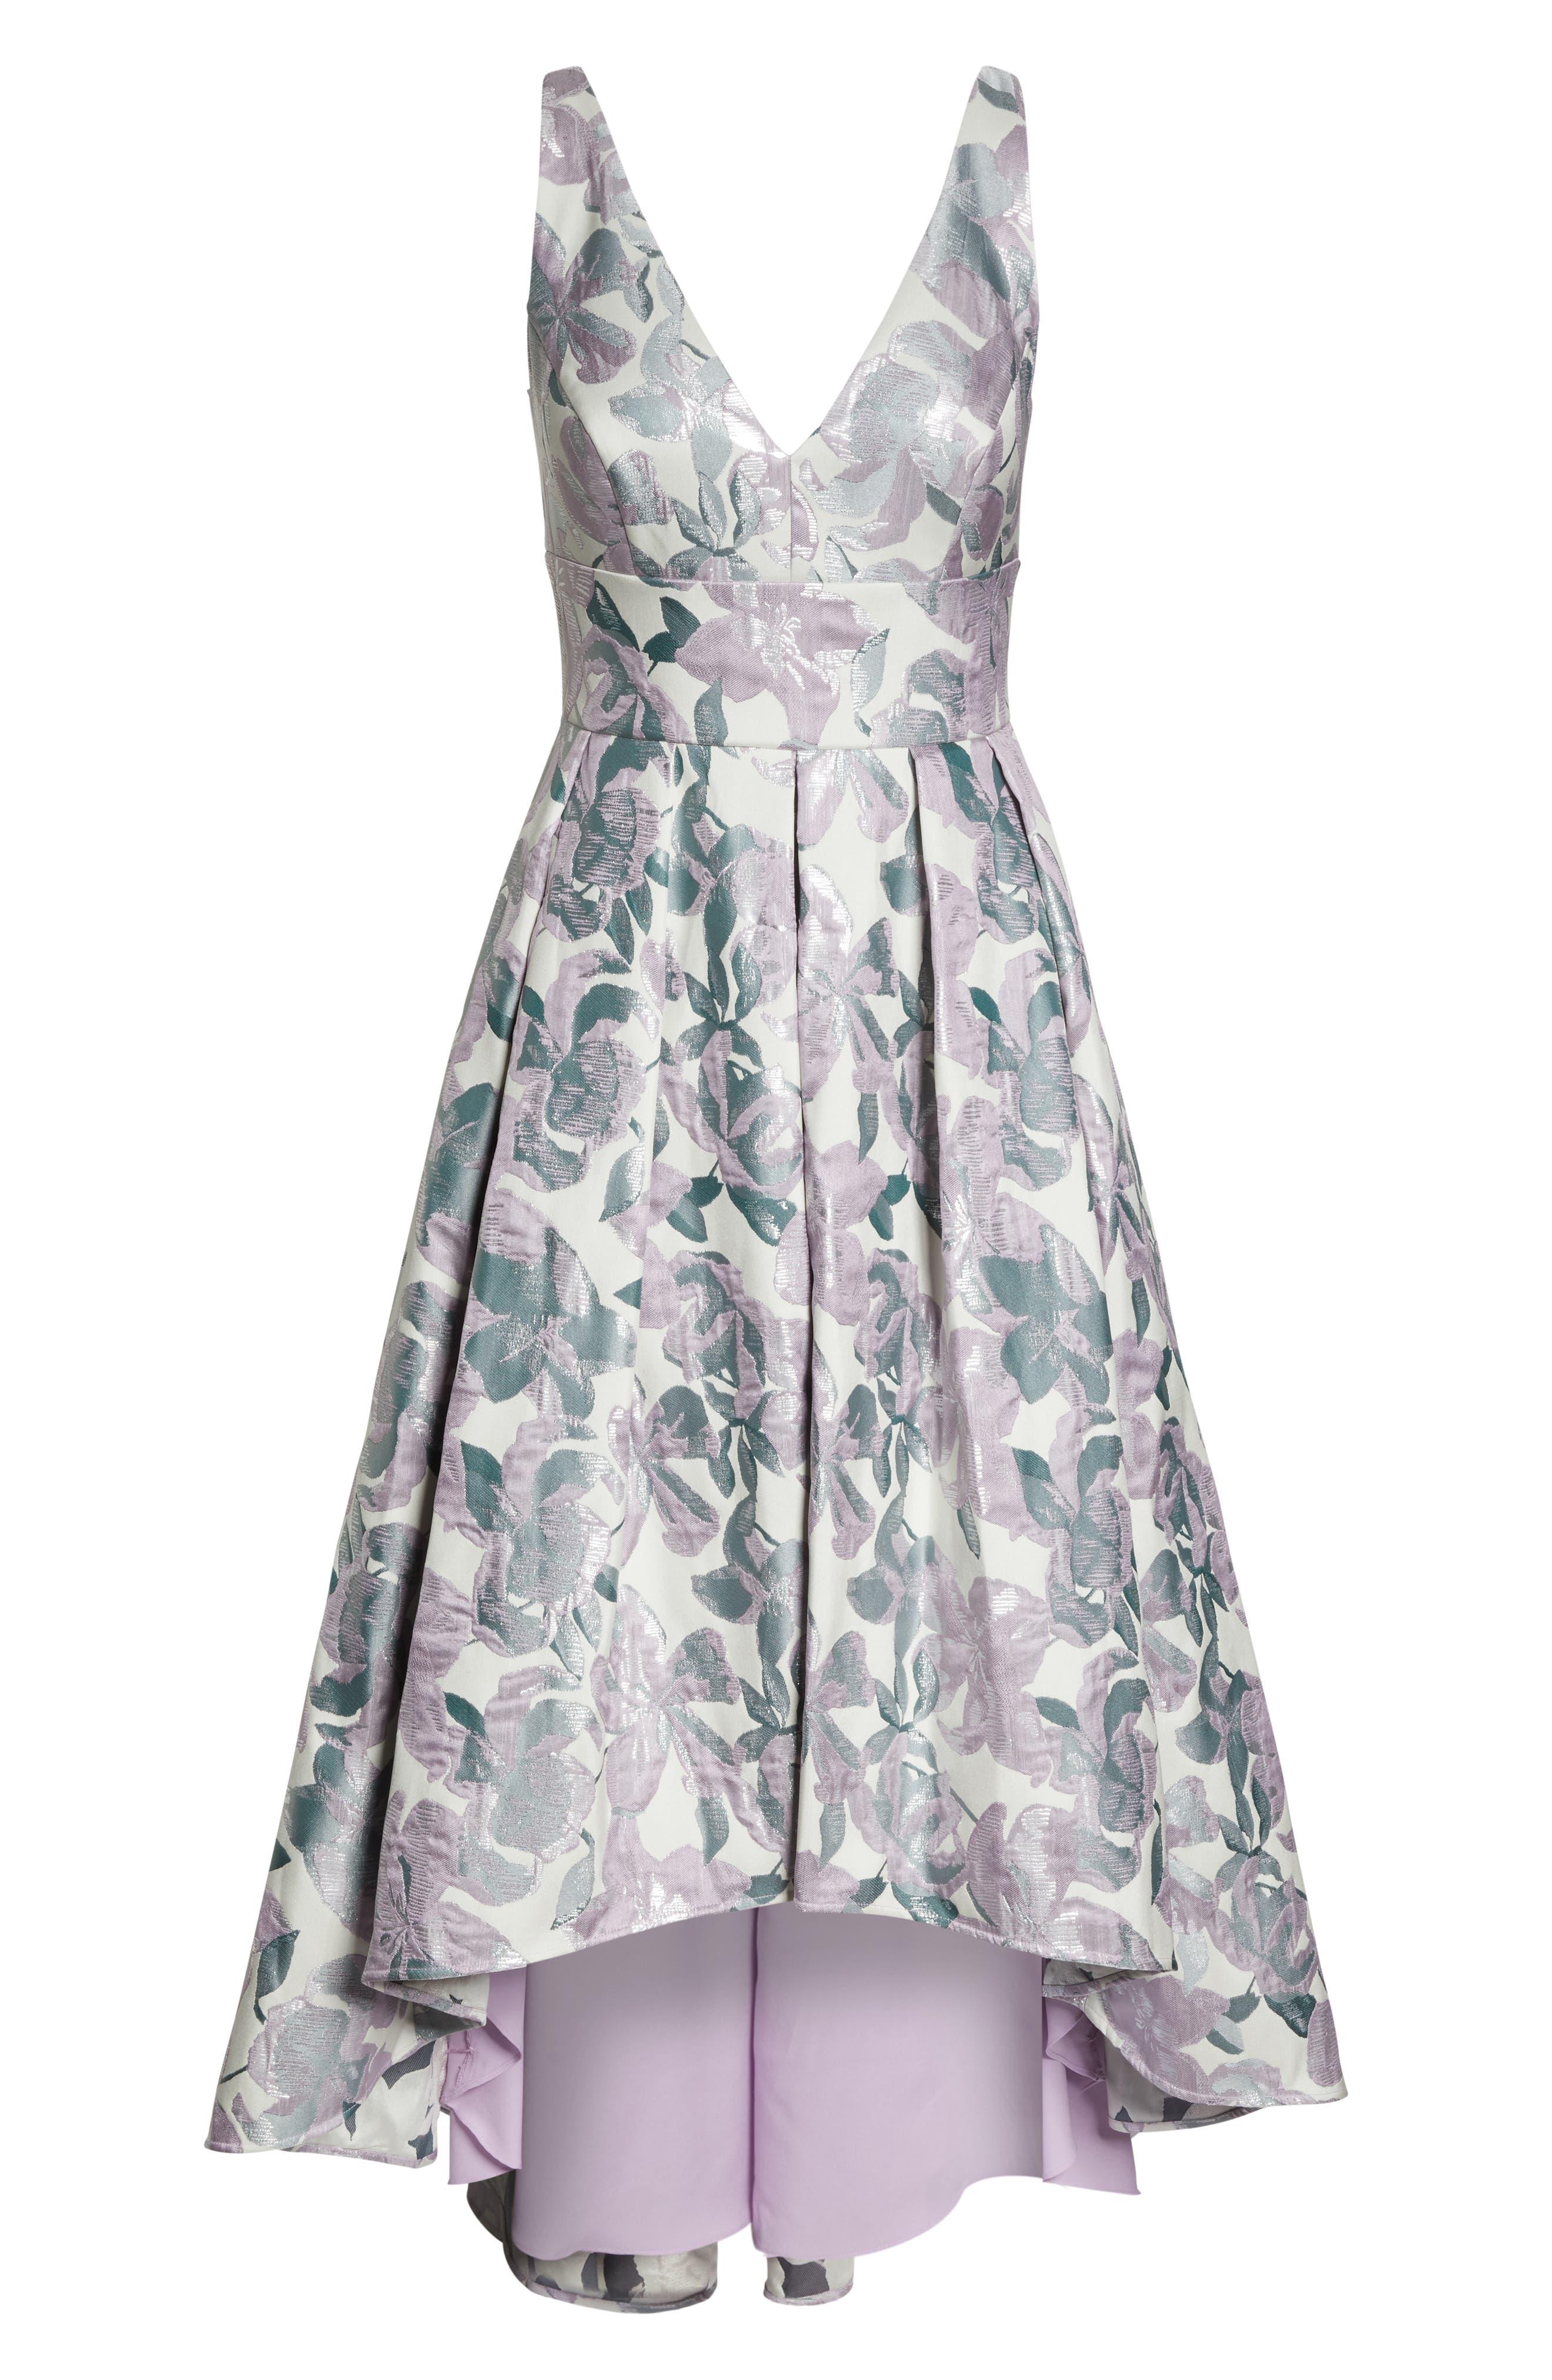 Floral Jacquard High/Low Evening Dress,                             Alternate thumbnail 7, color,                             LILAC COMBINATION